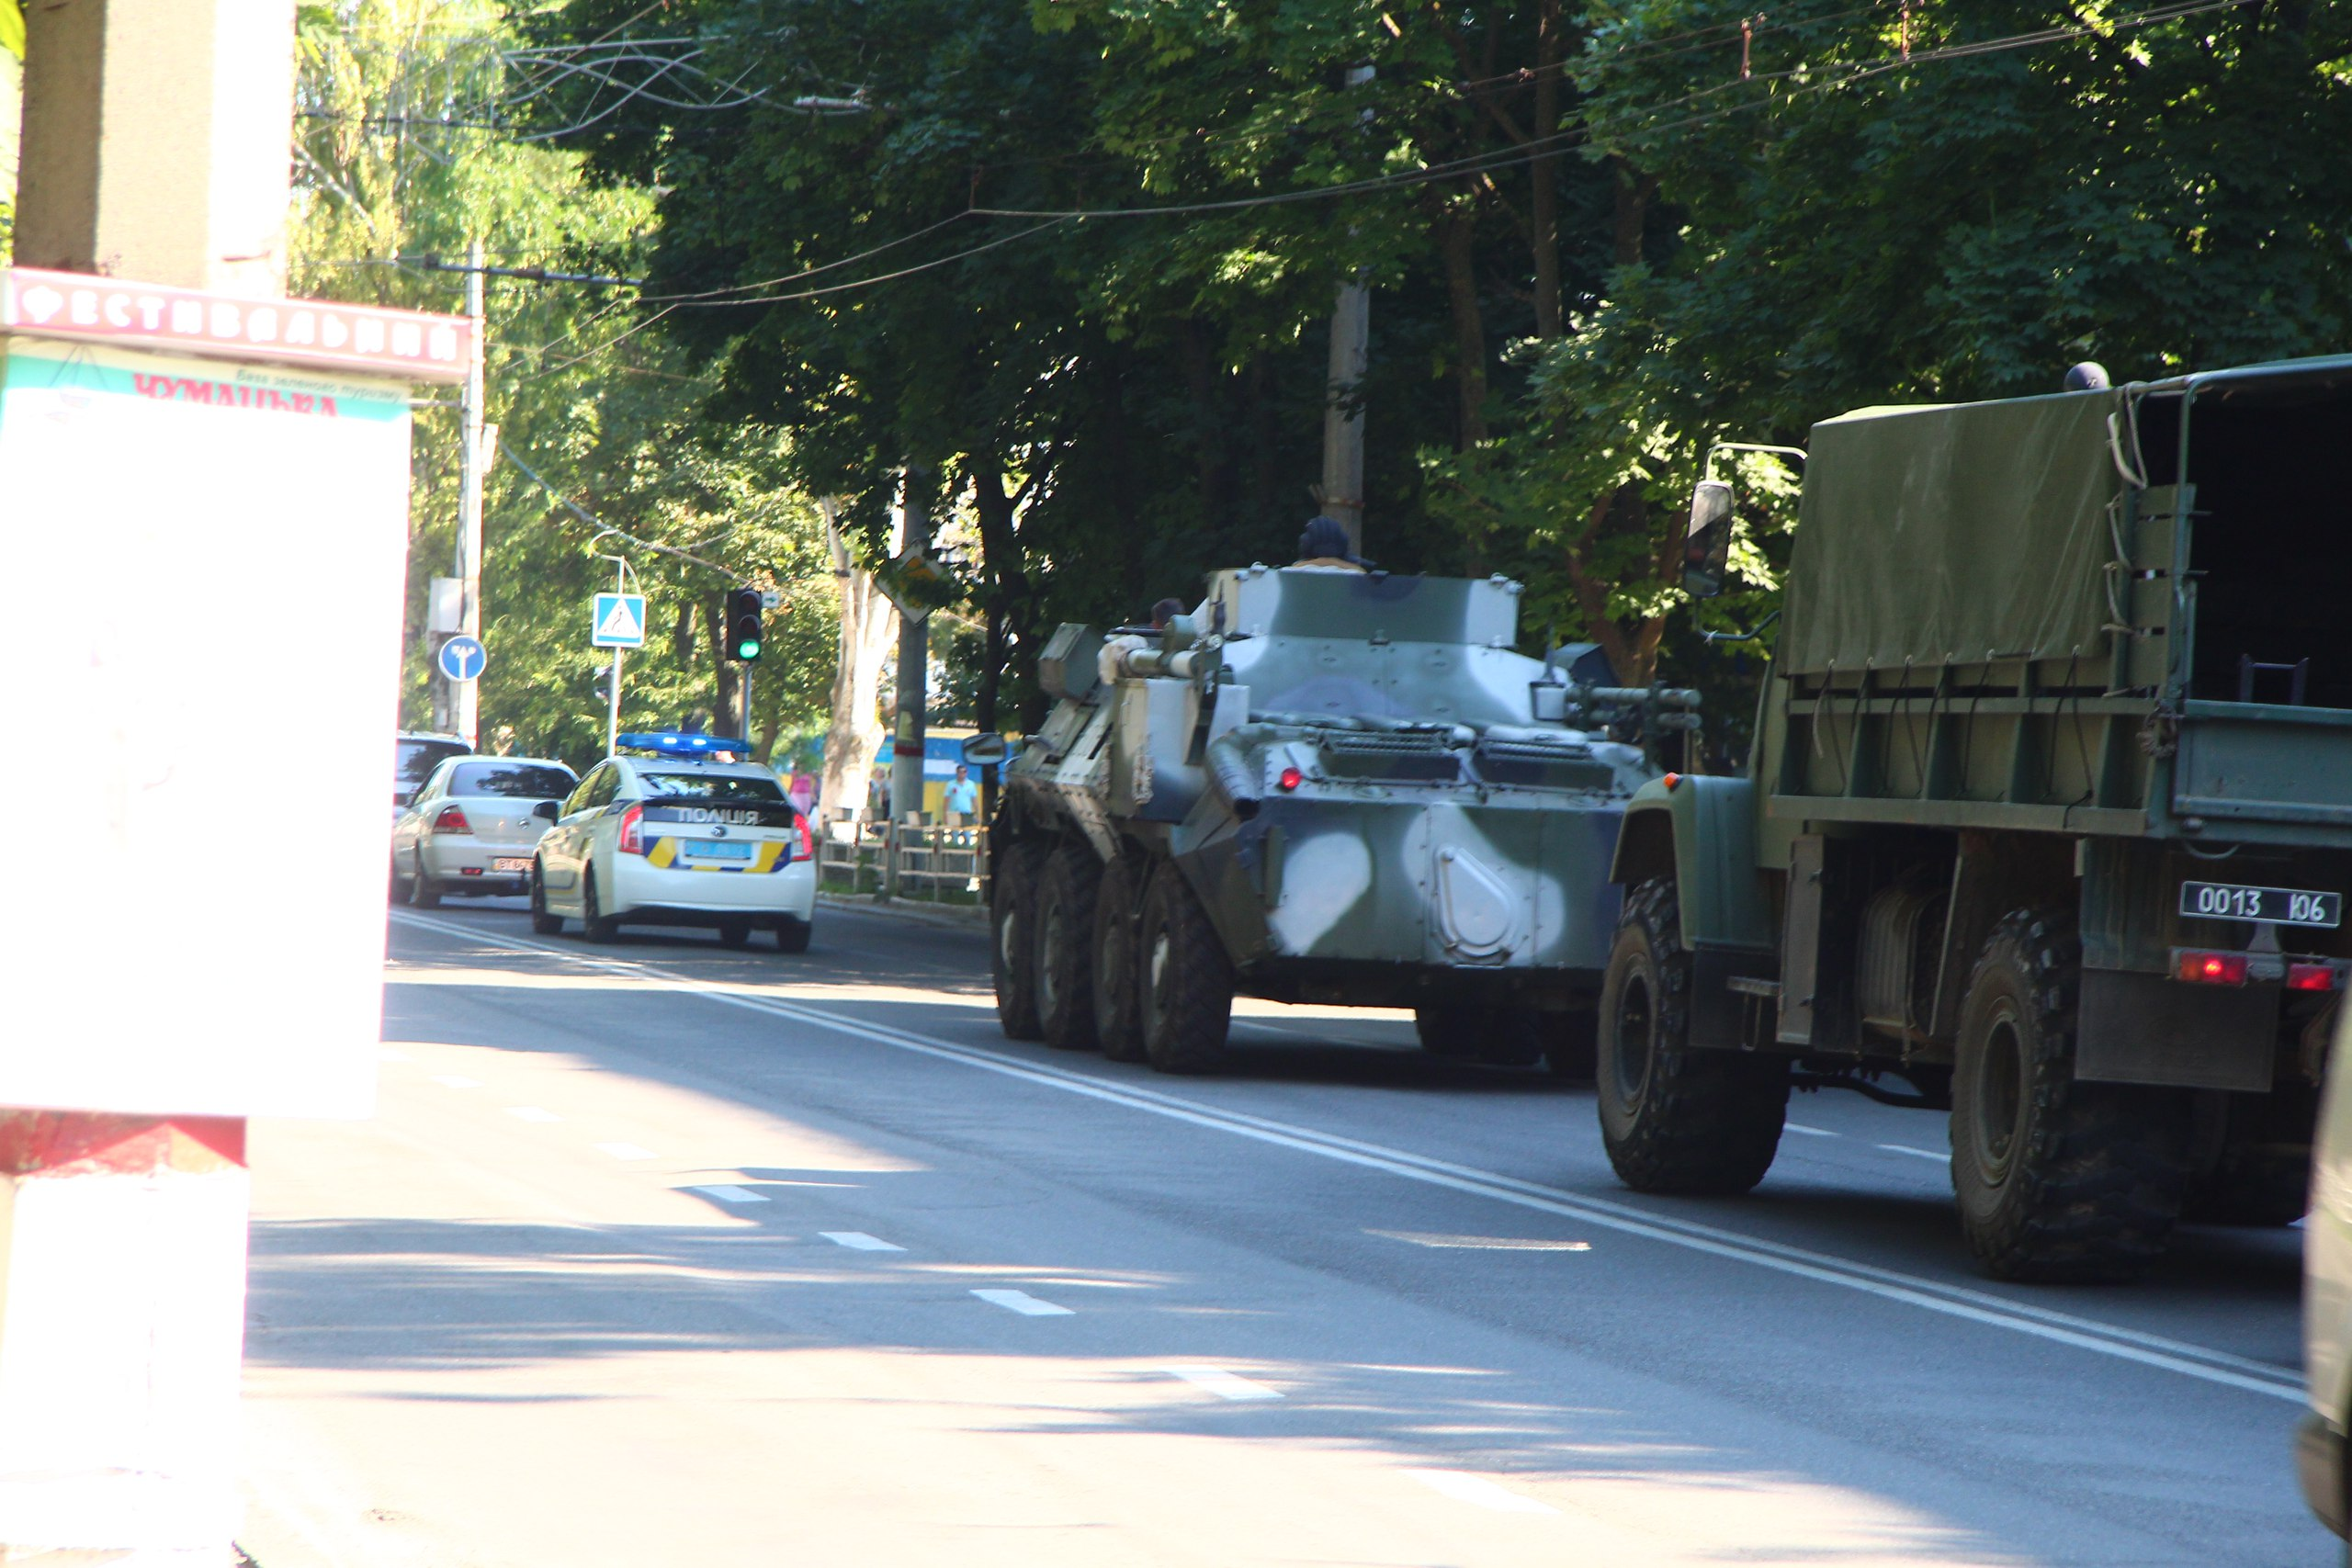 В центре Херсона ездят БТР и военная техника (фото)